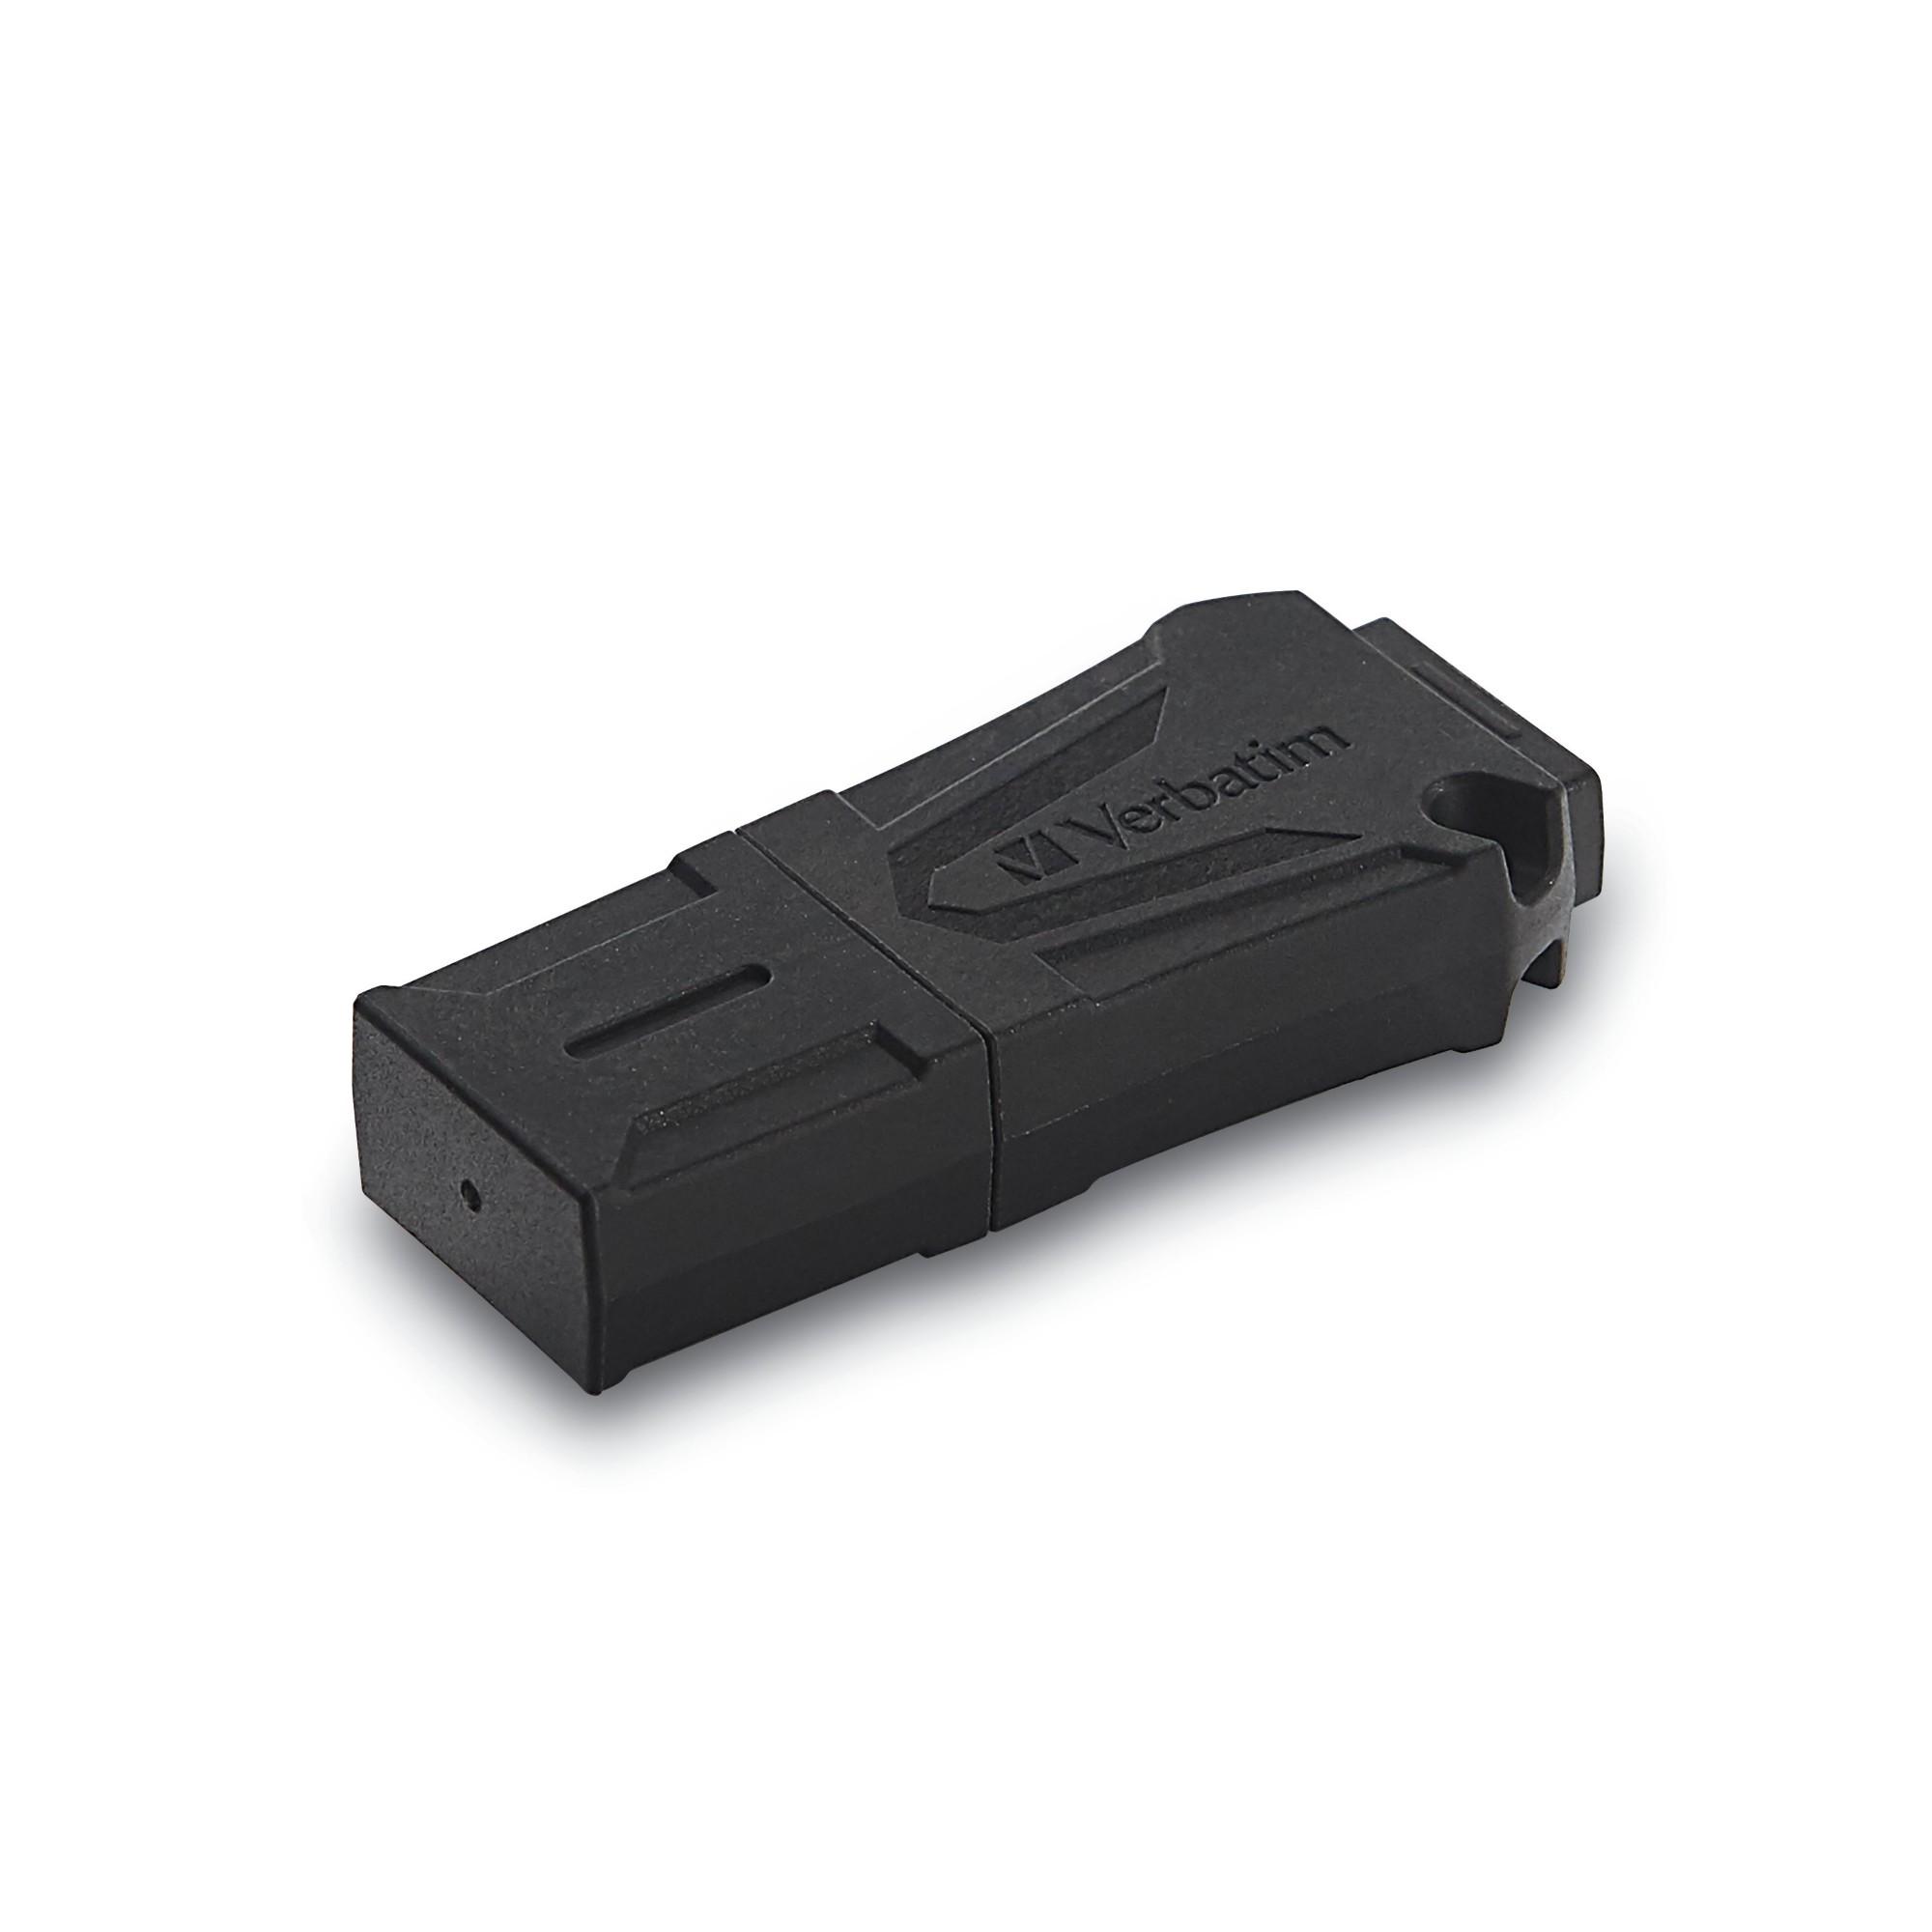 Verbatim ToughMAX USB flash drive 64 GB USB Type-A 2.0 Black